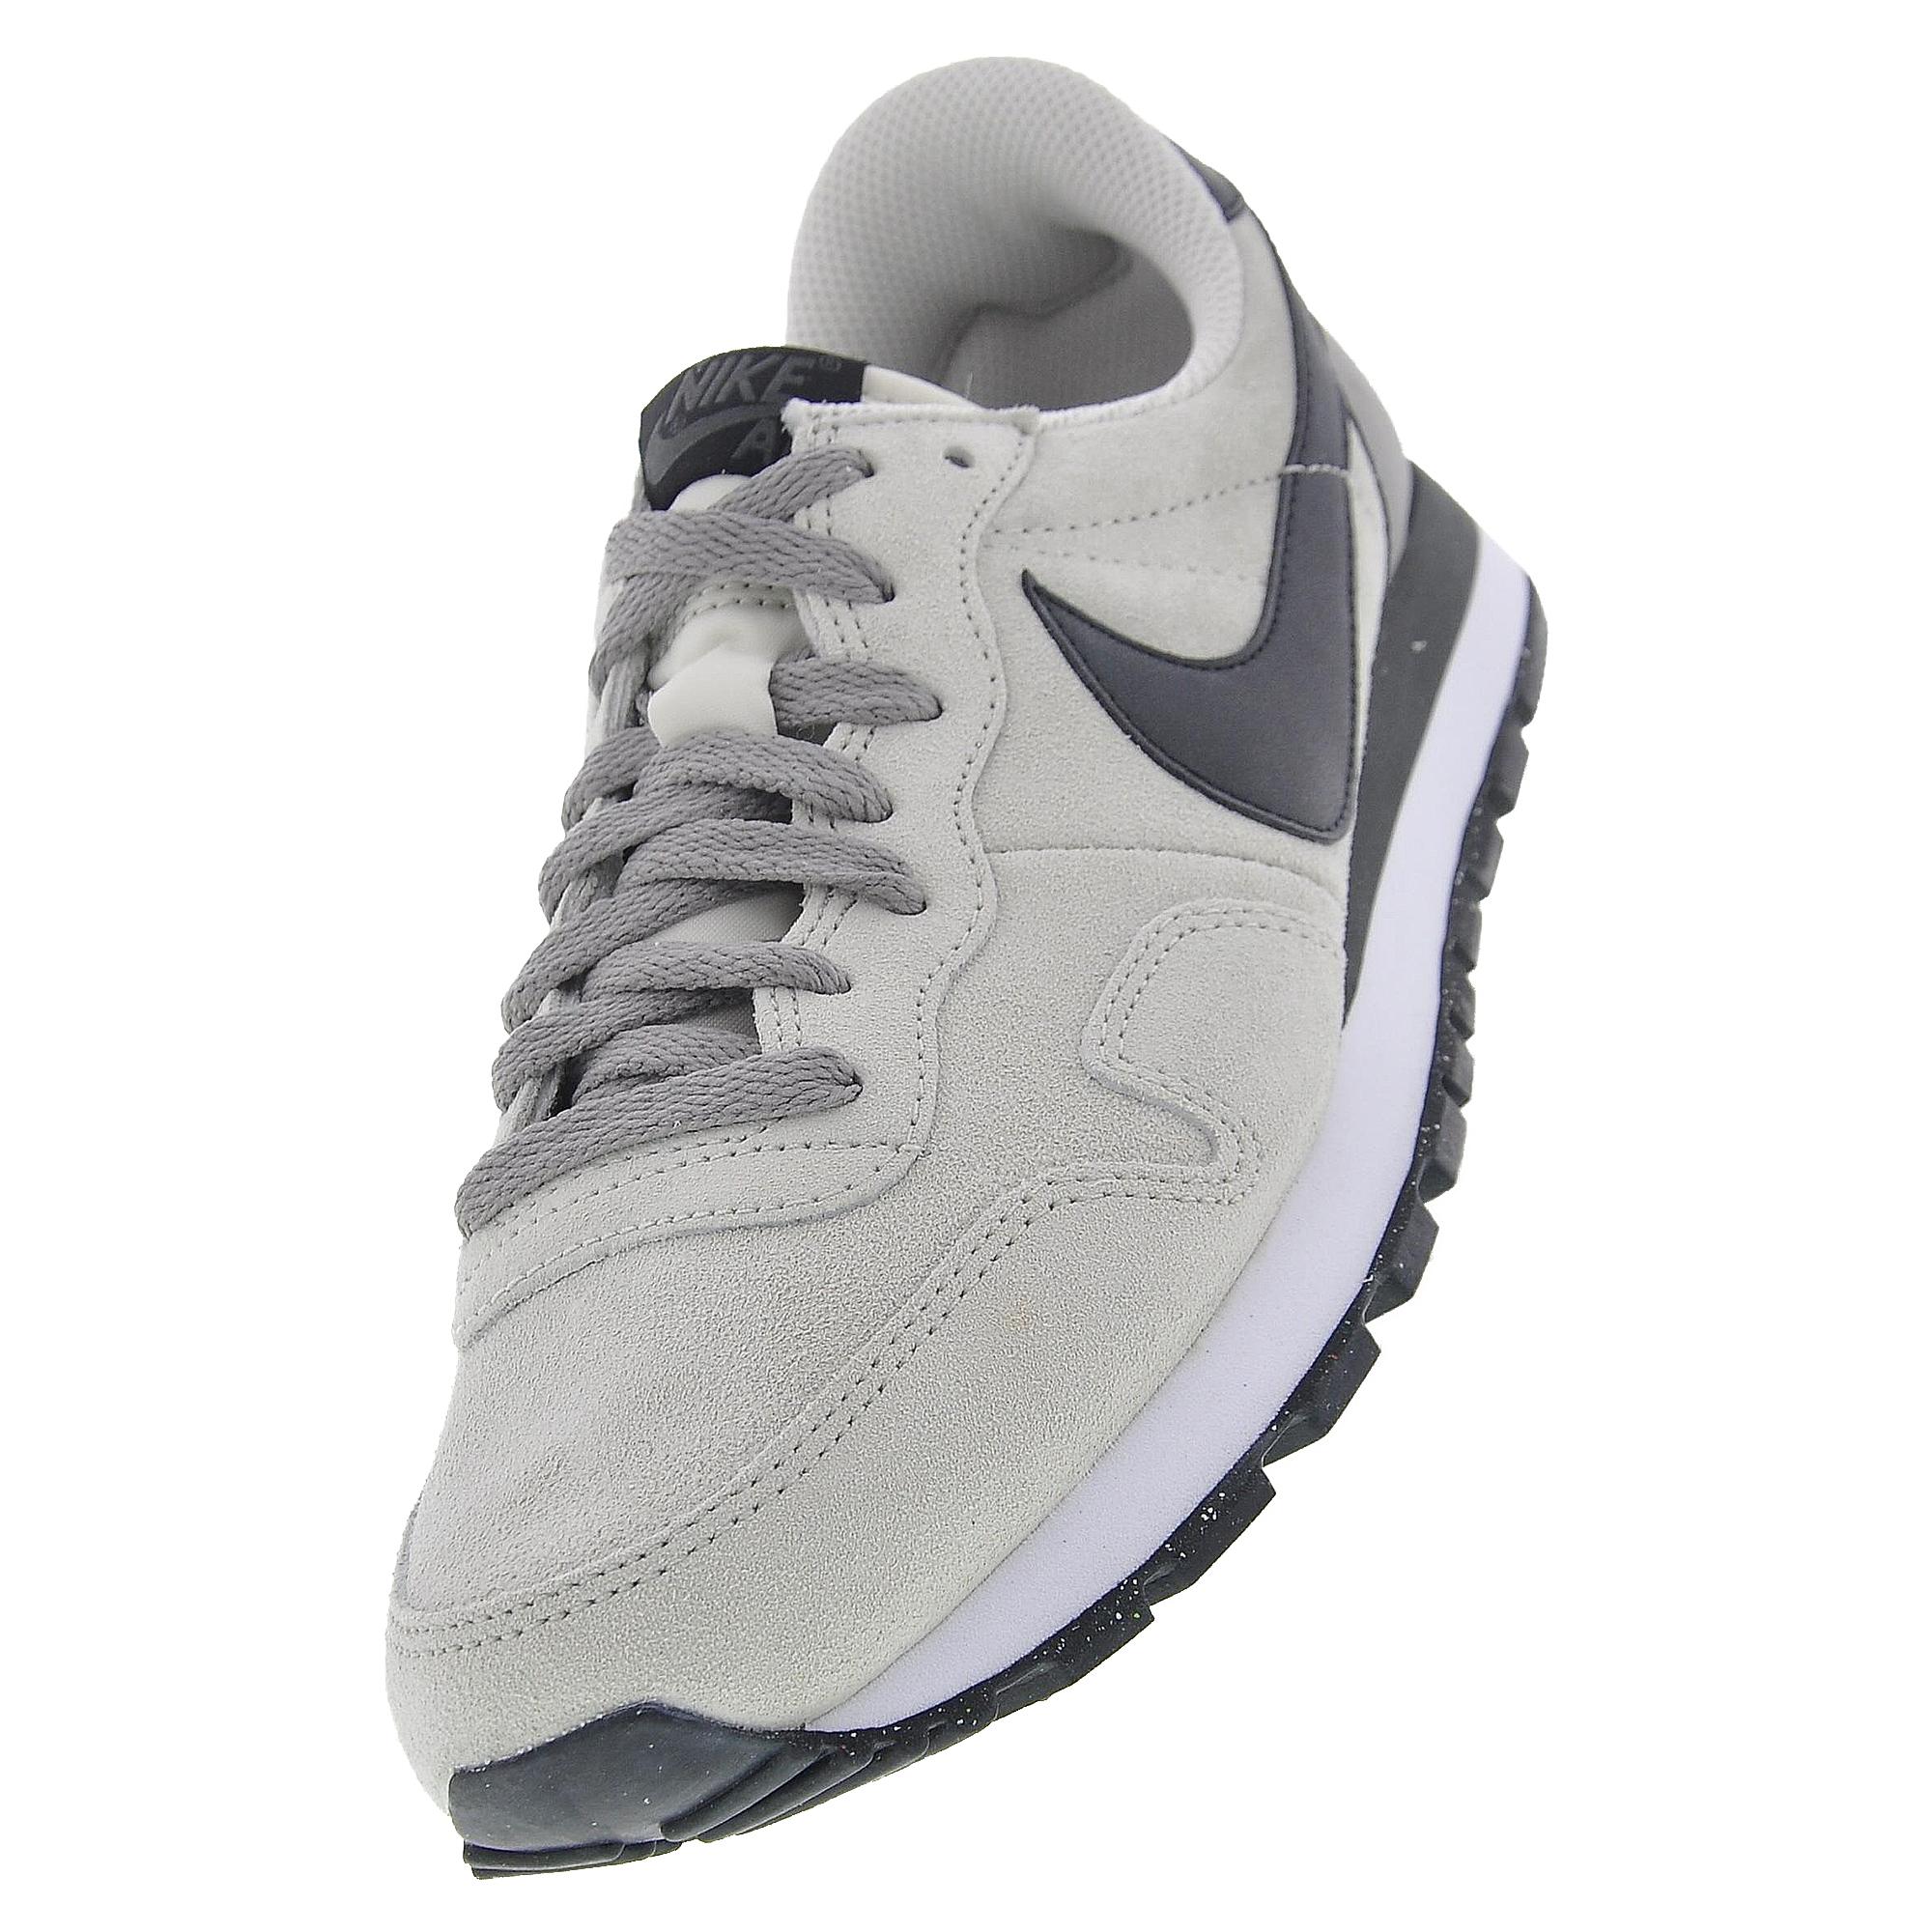 0fc1c6da6a60a Nike Free 6.0 Herren Toddlers Shoes On Sale